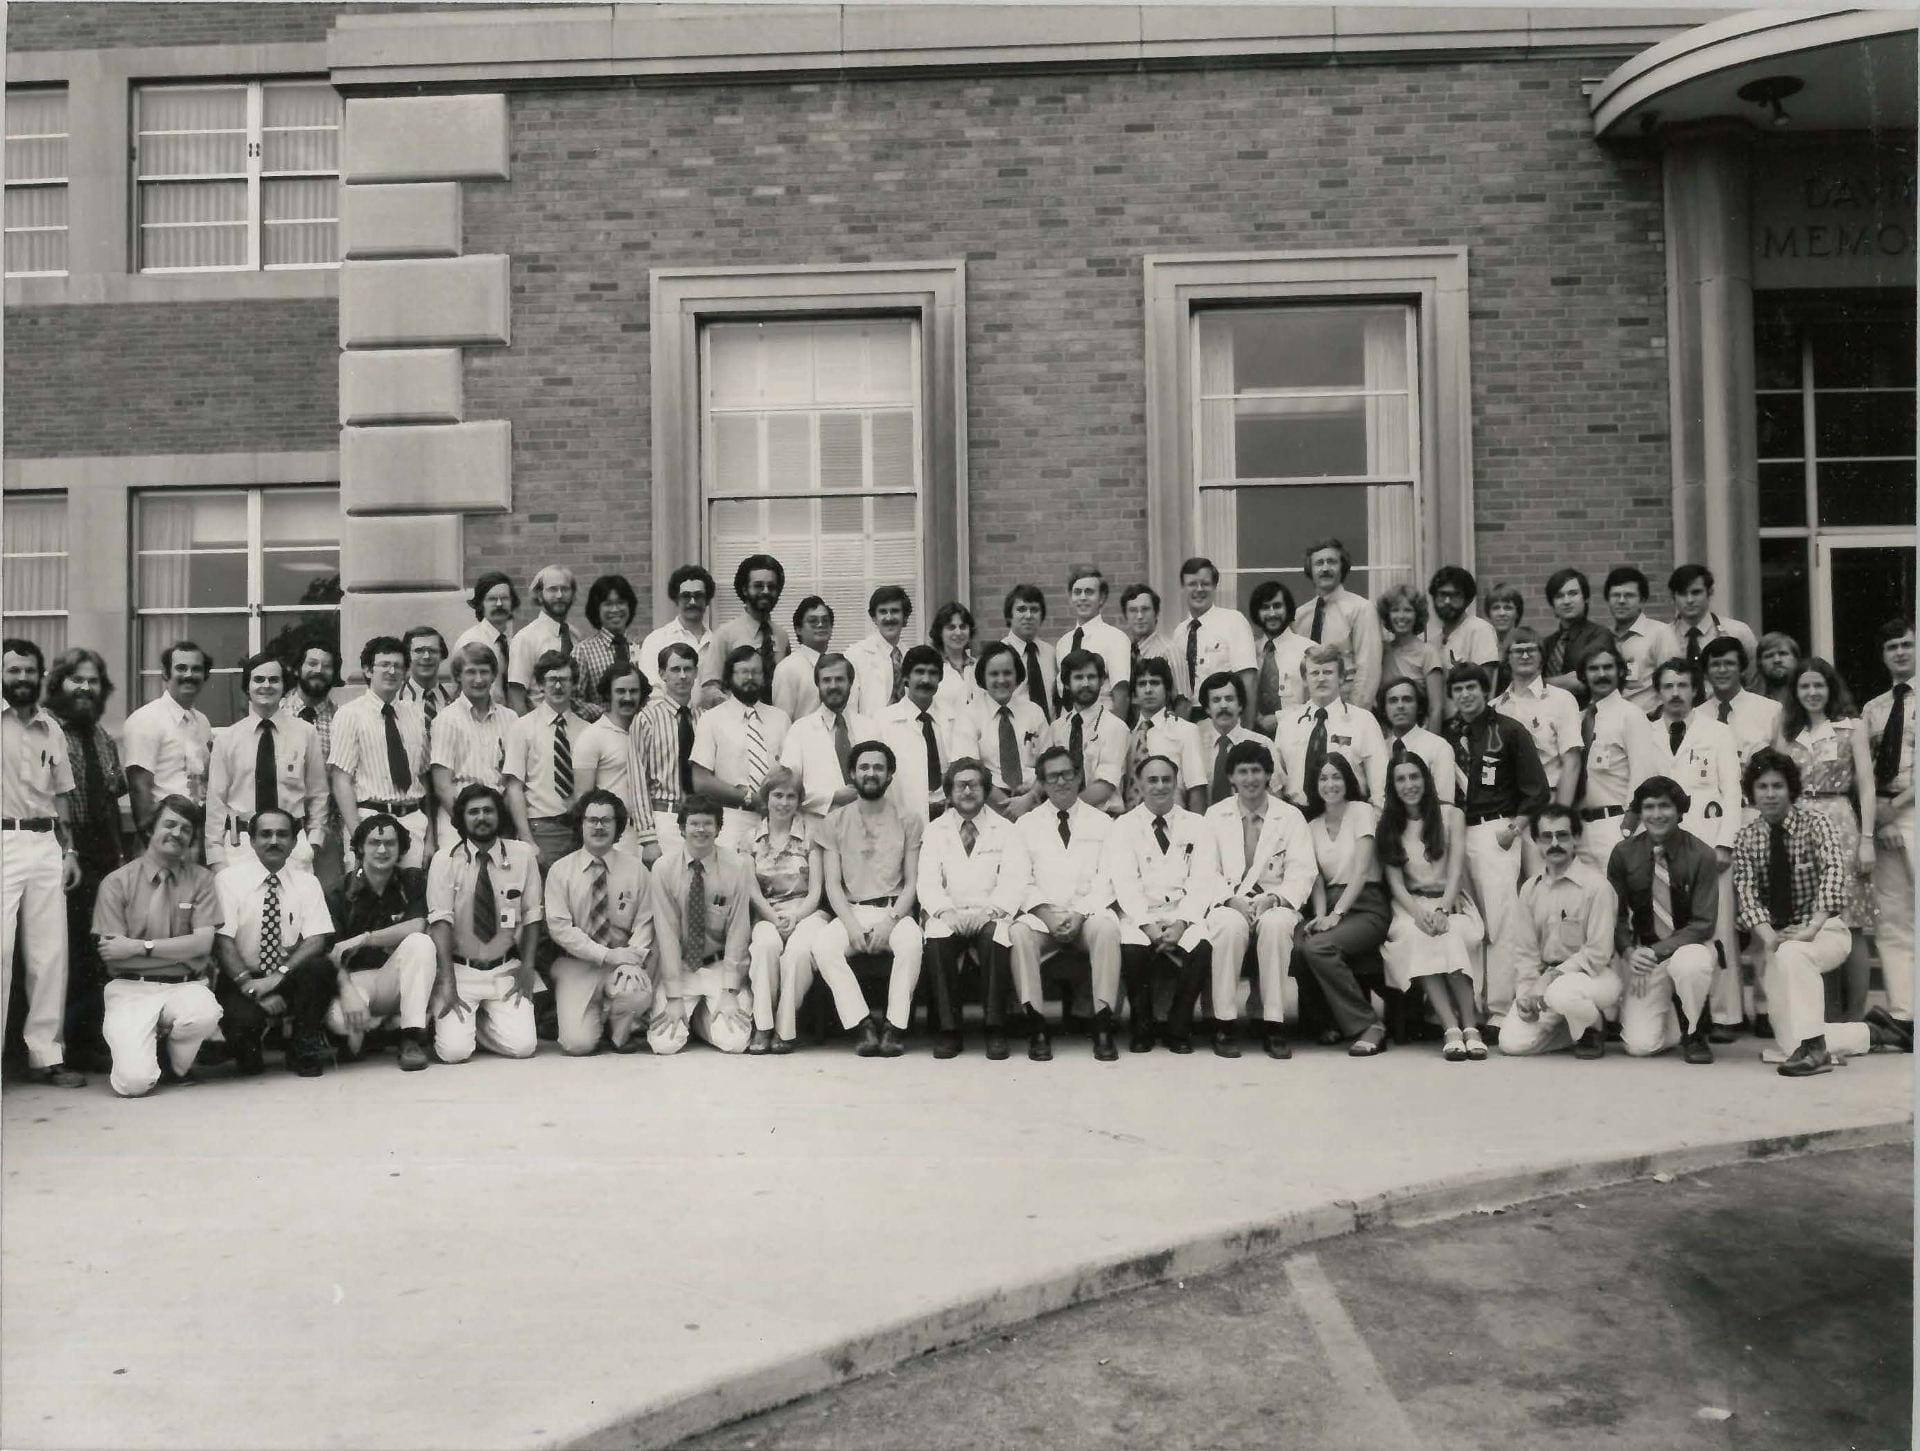 1978 Housestaff Photo